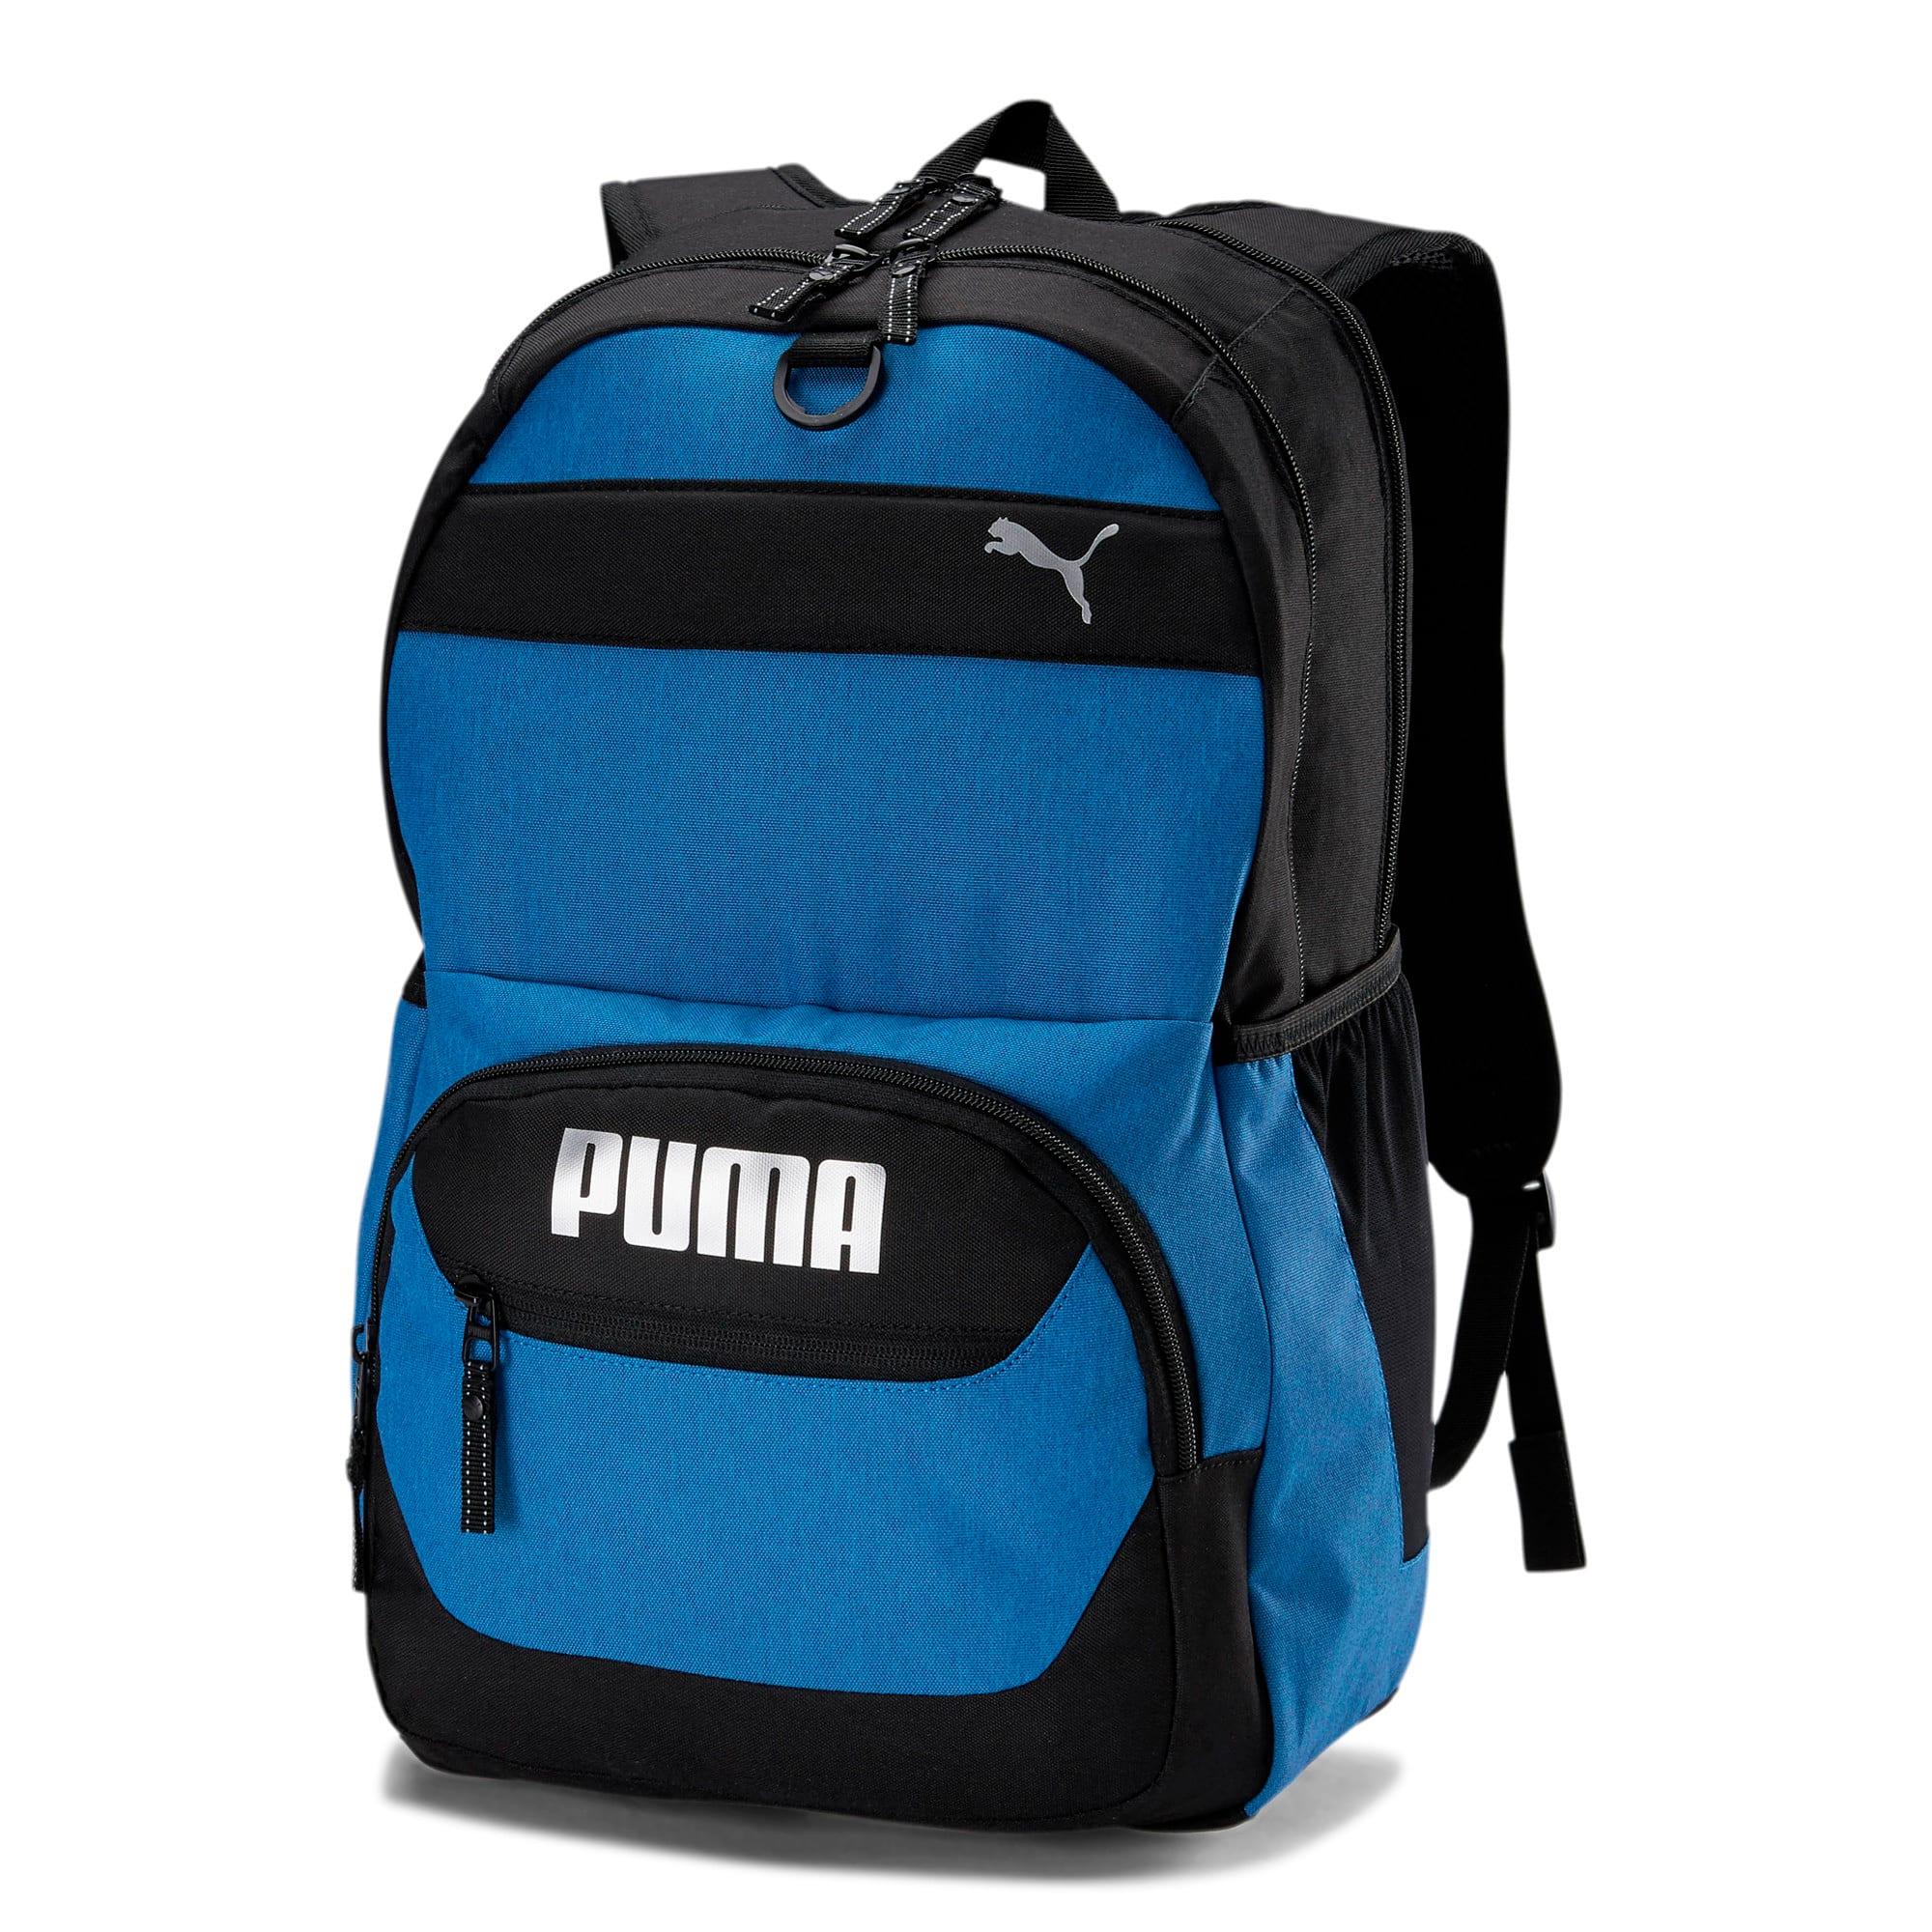 Thumbnail 1 of PUMA Everready Backpack, Blue, medium